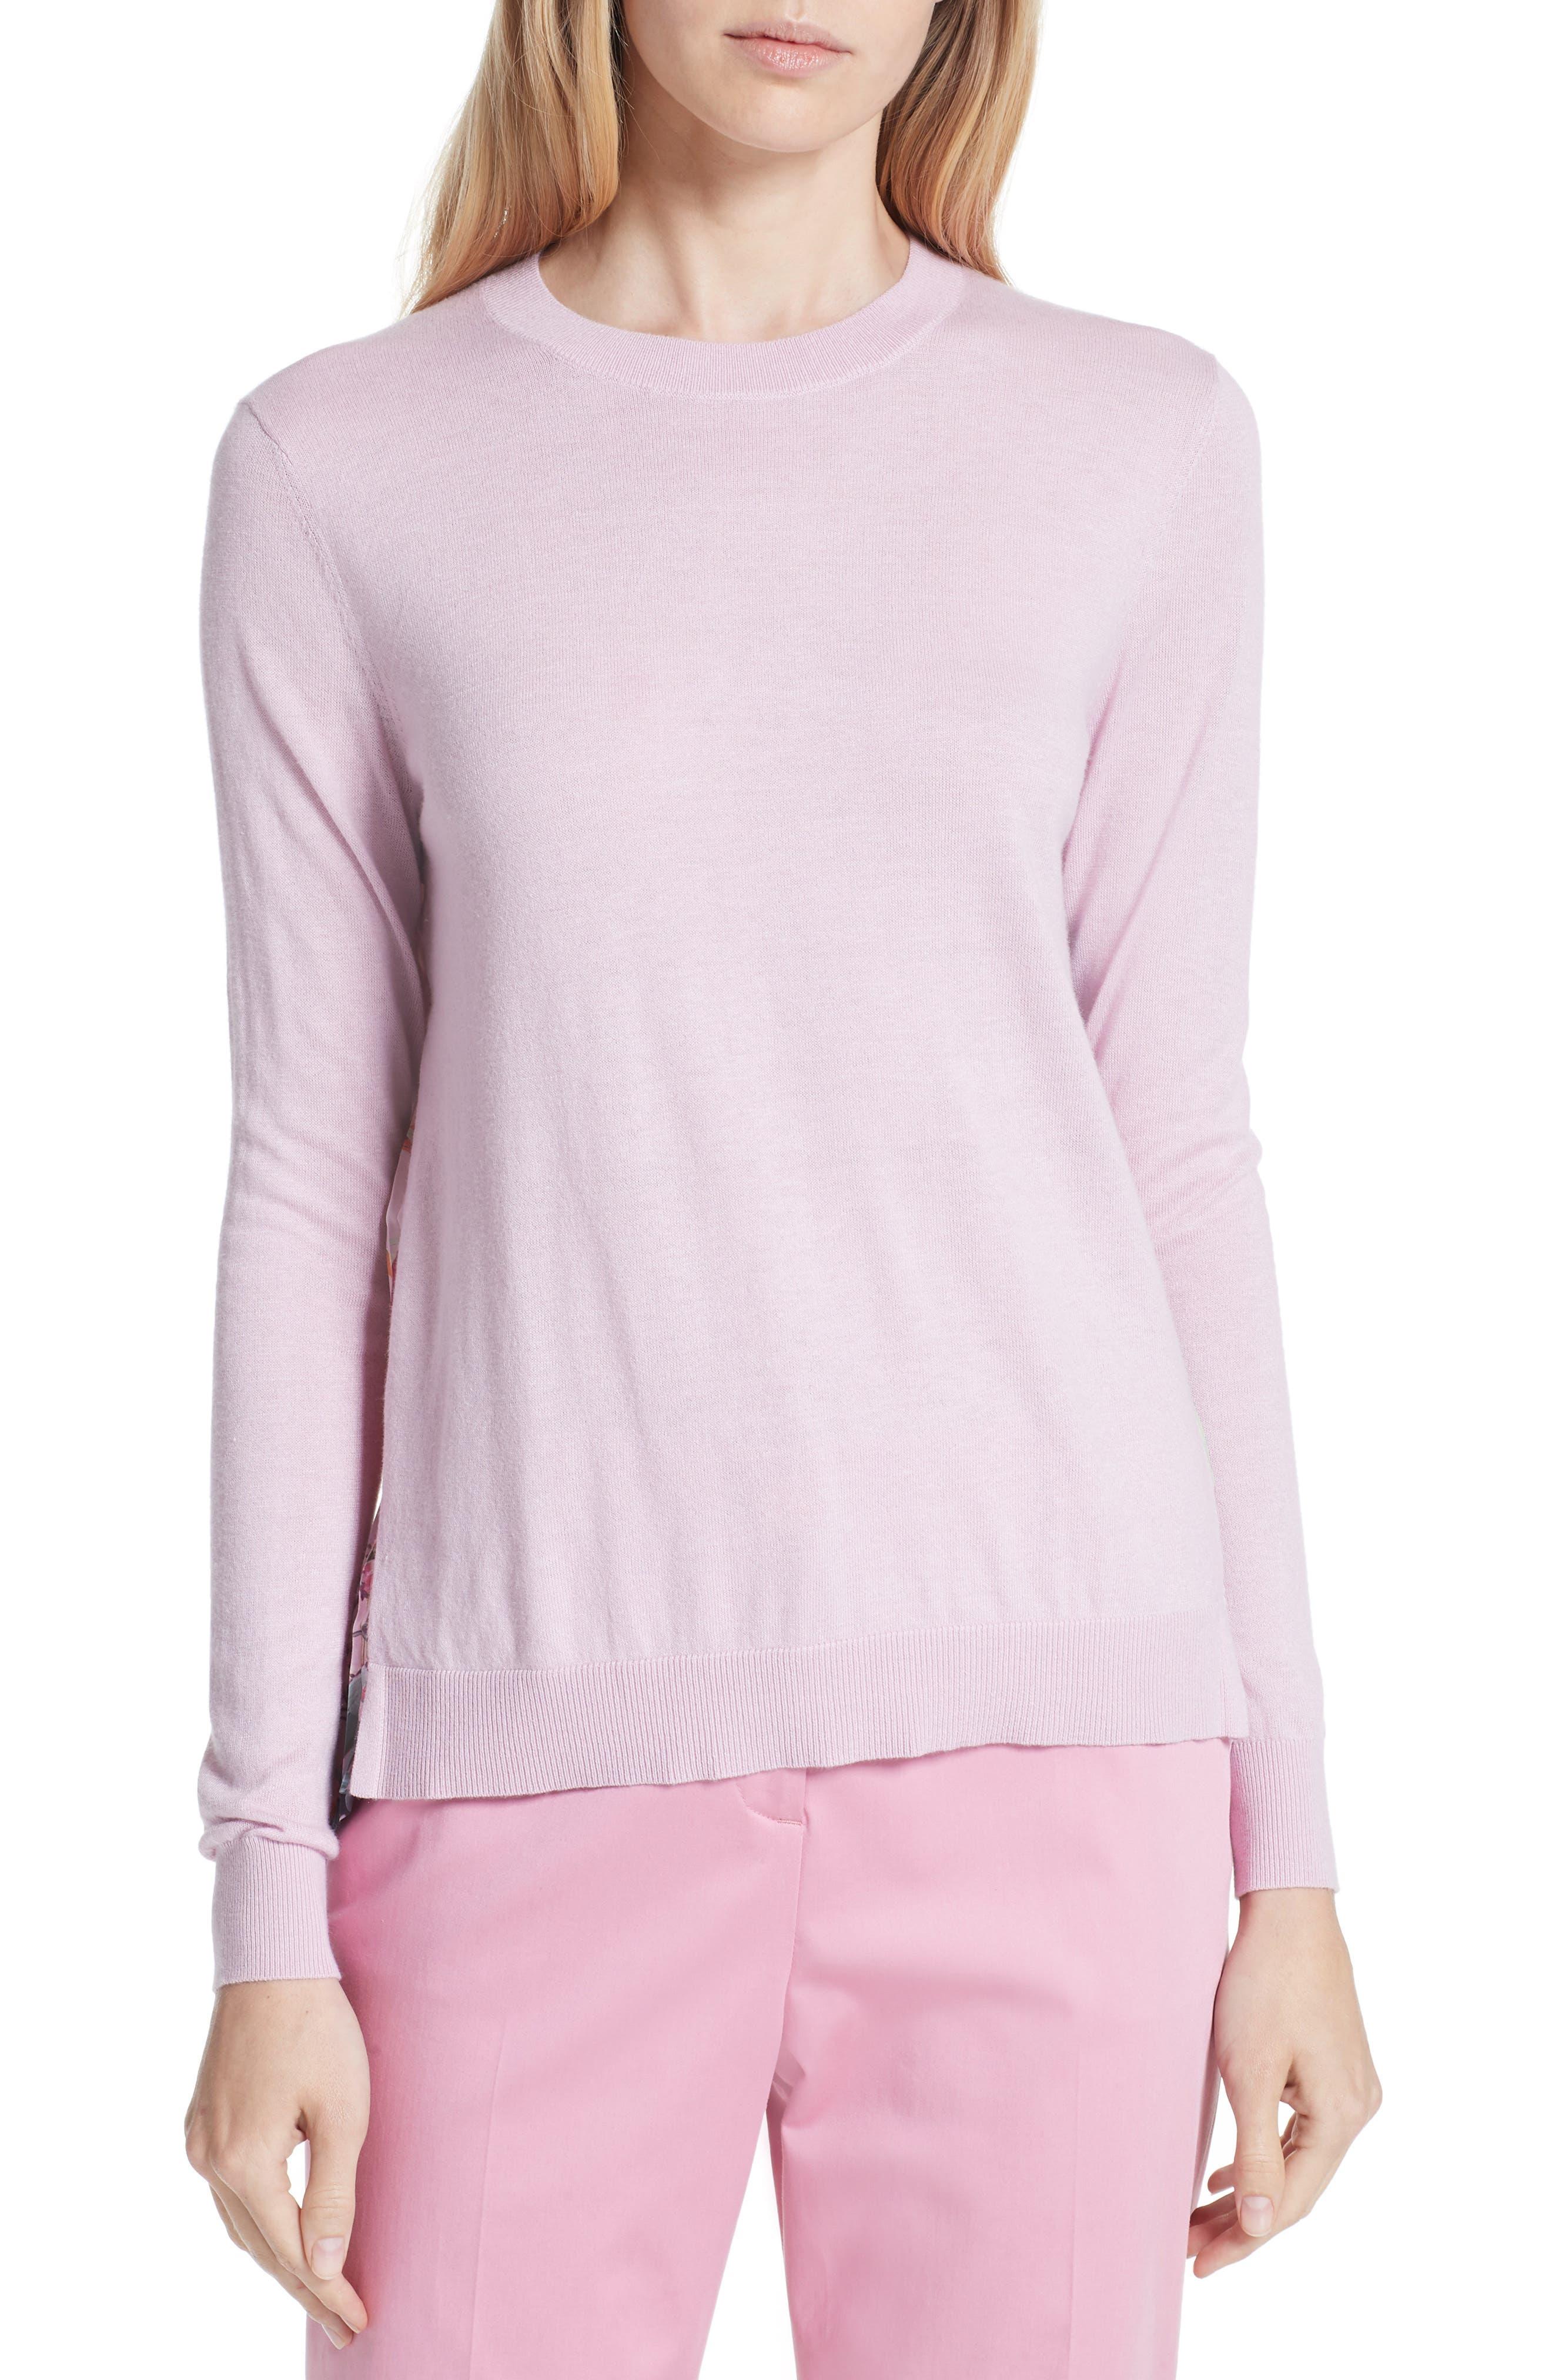 Kaleese Serenity Pleat Back Silk Cotton Sweater,                             Main thumbnail 1, color,                             531